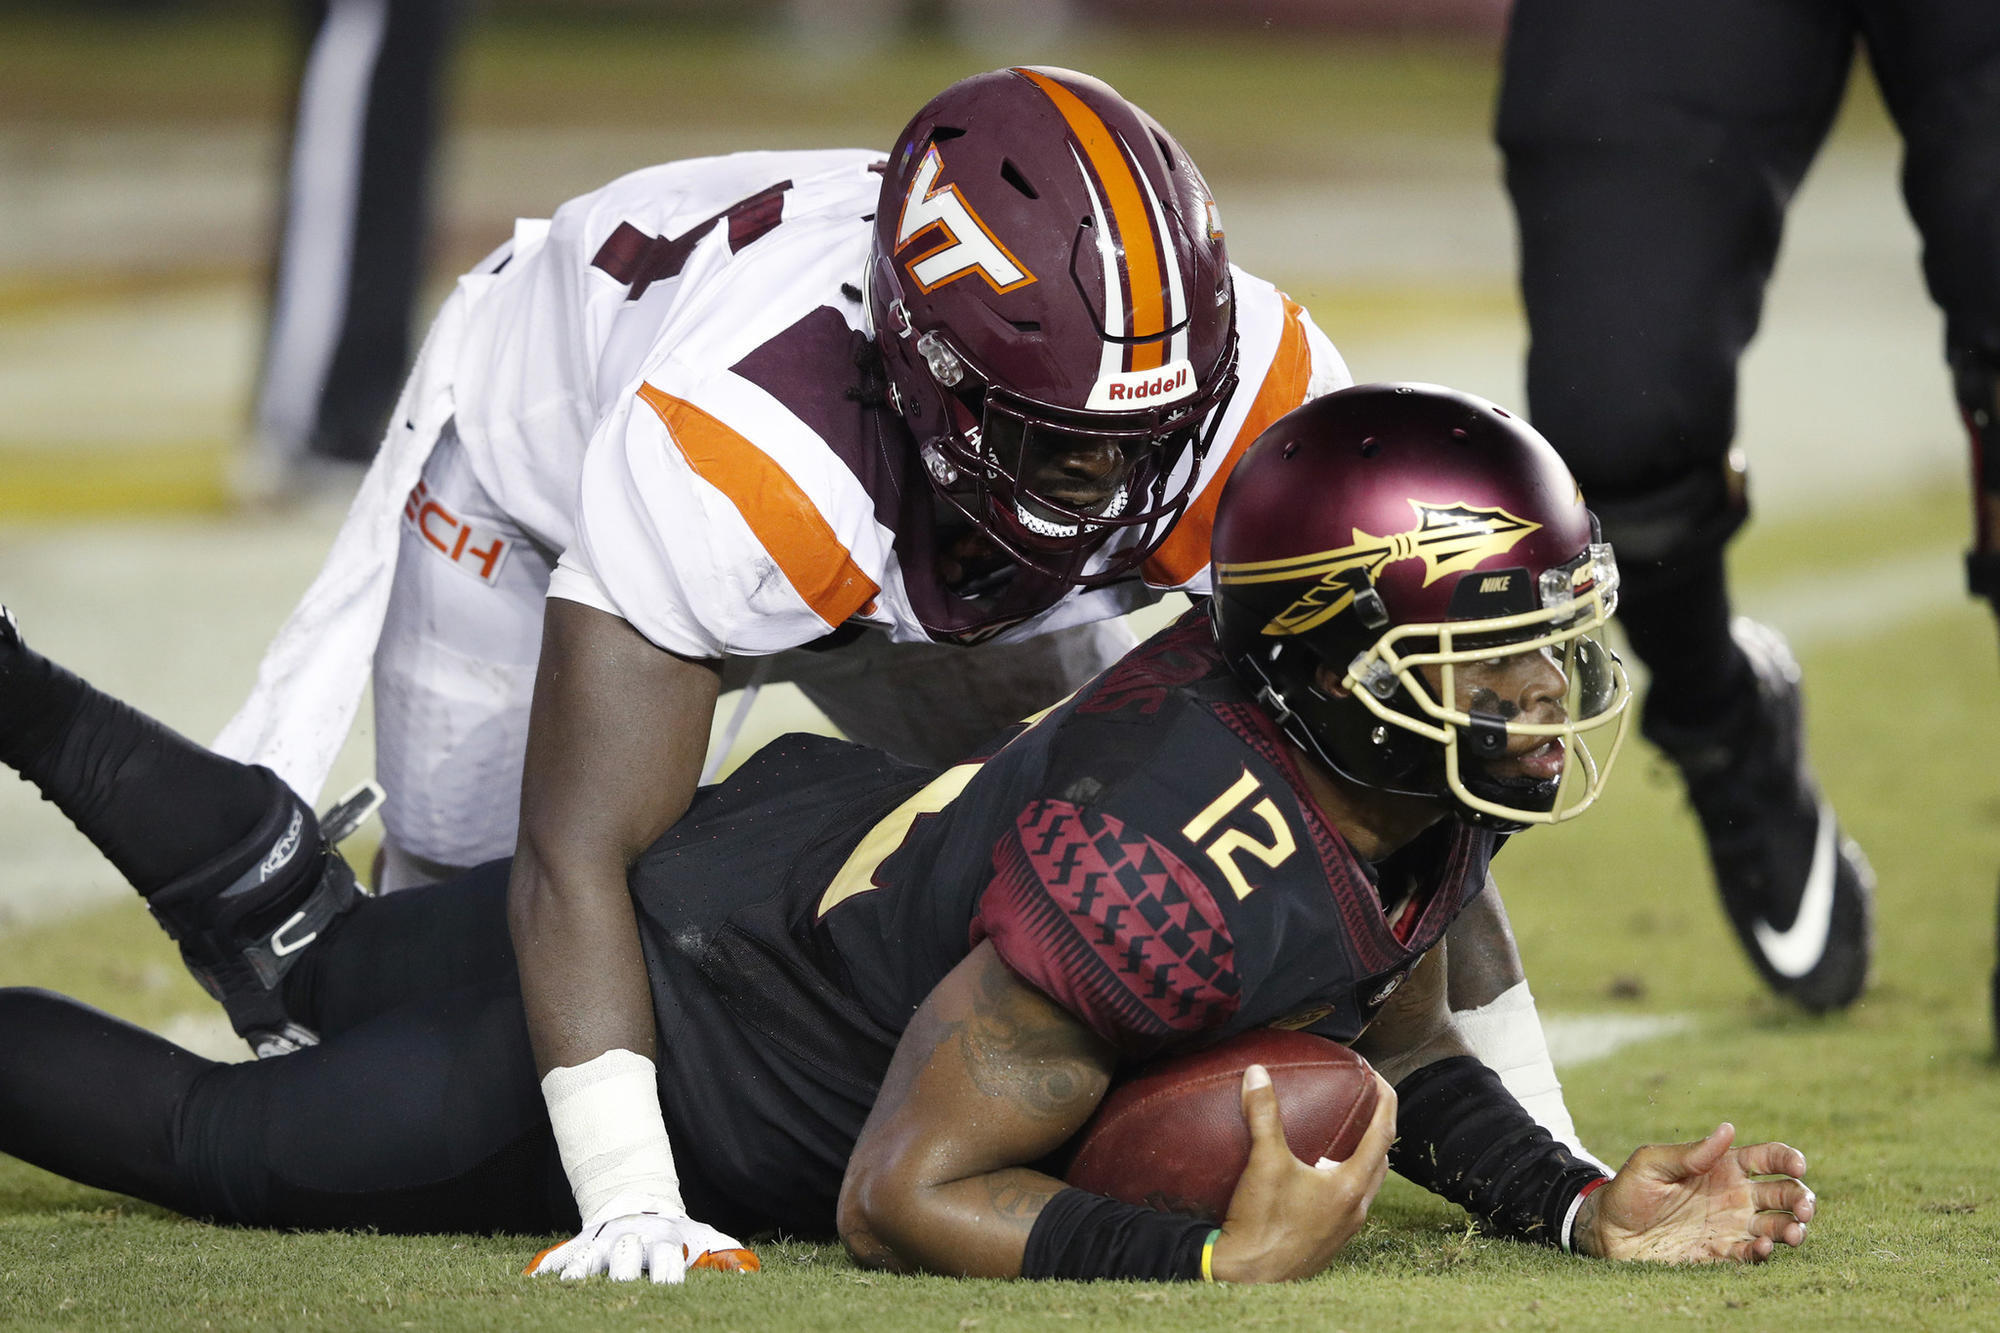 Fsu Offense Stalls Seminoles Fall To Virginia Tech In Taggart S